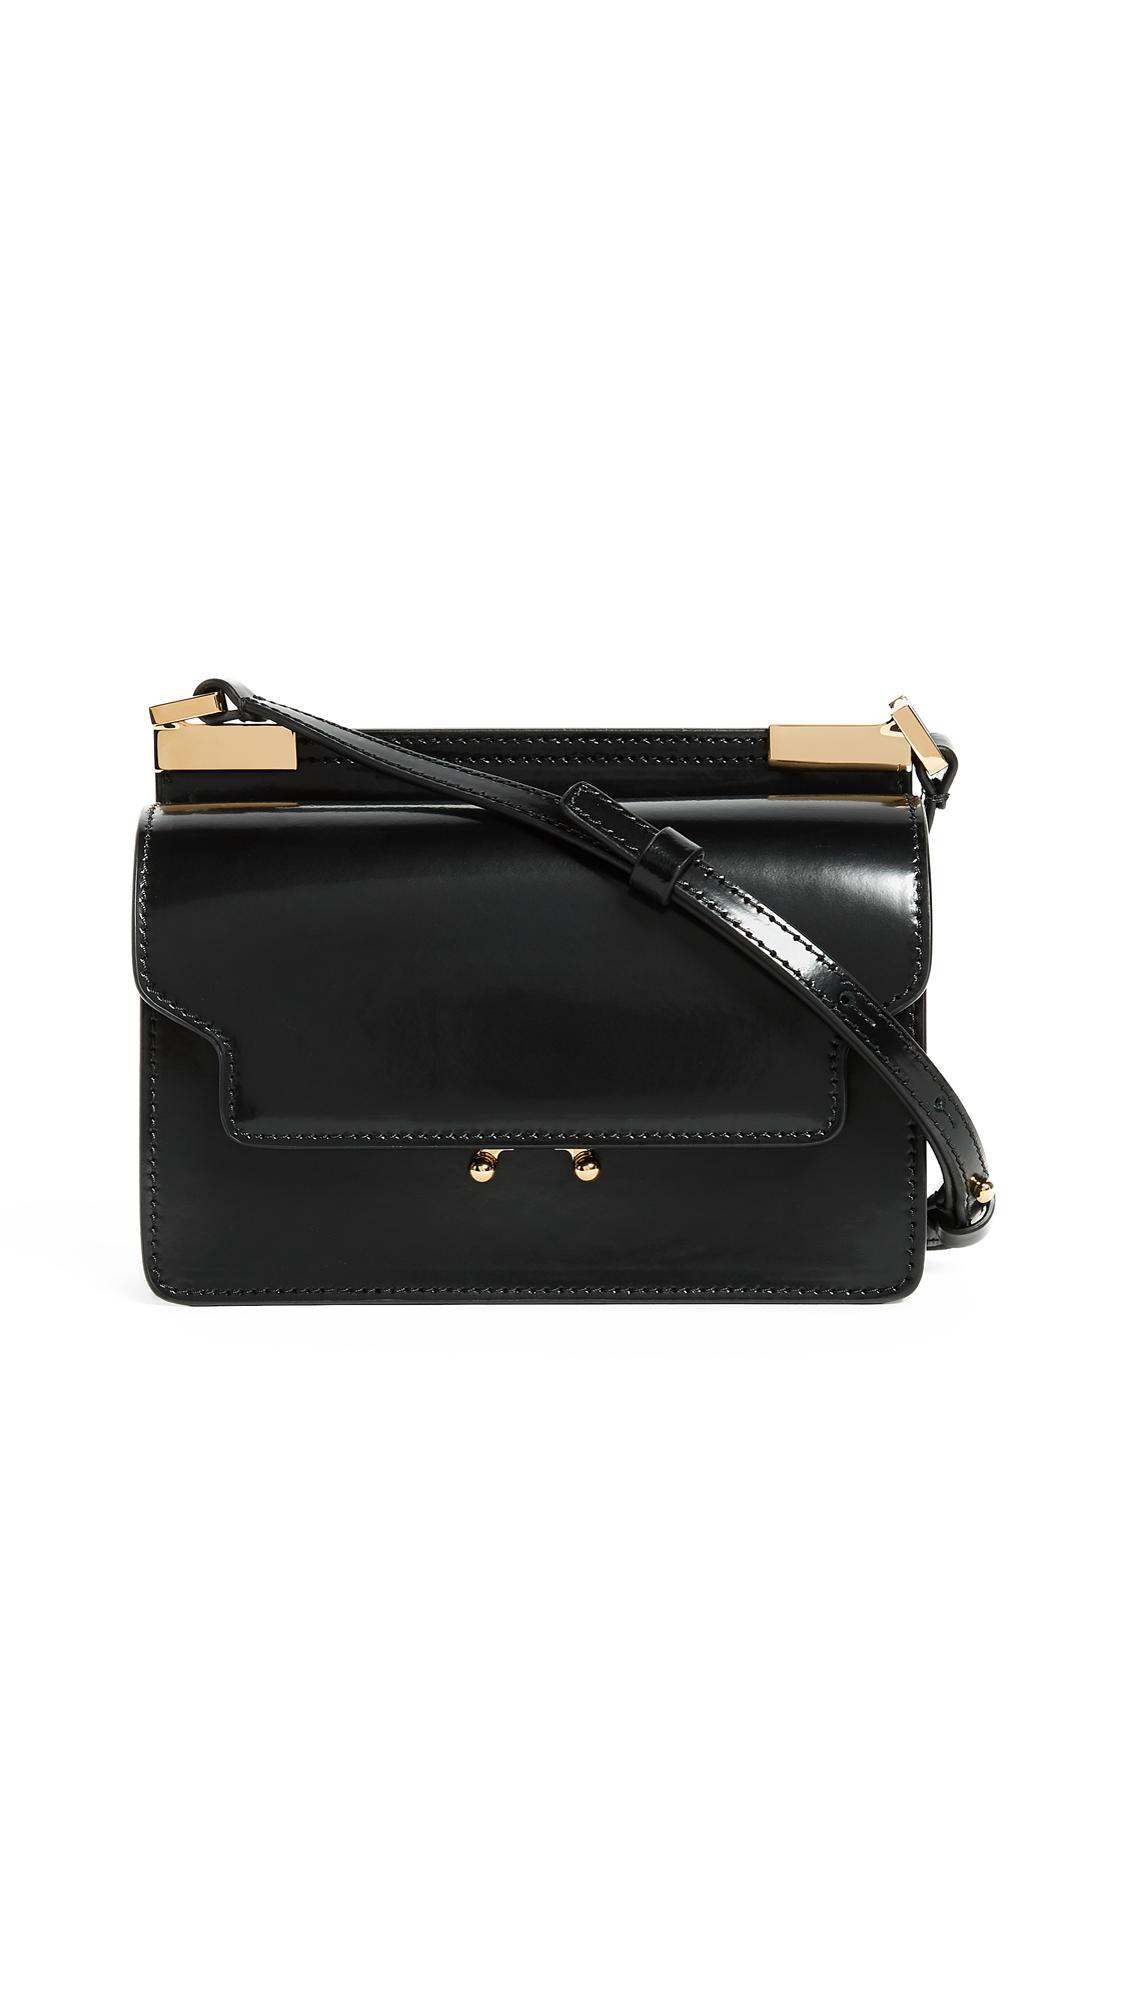 Marni Cross Body Bag - Black